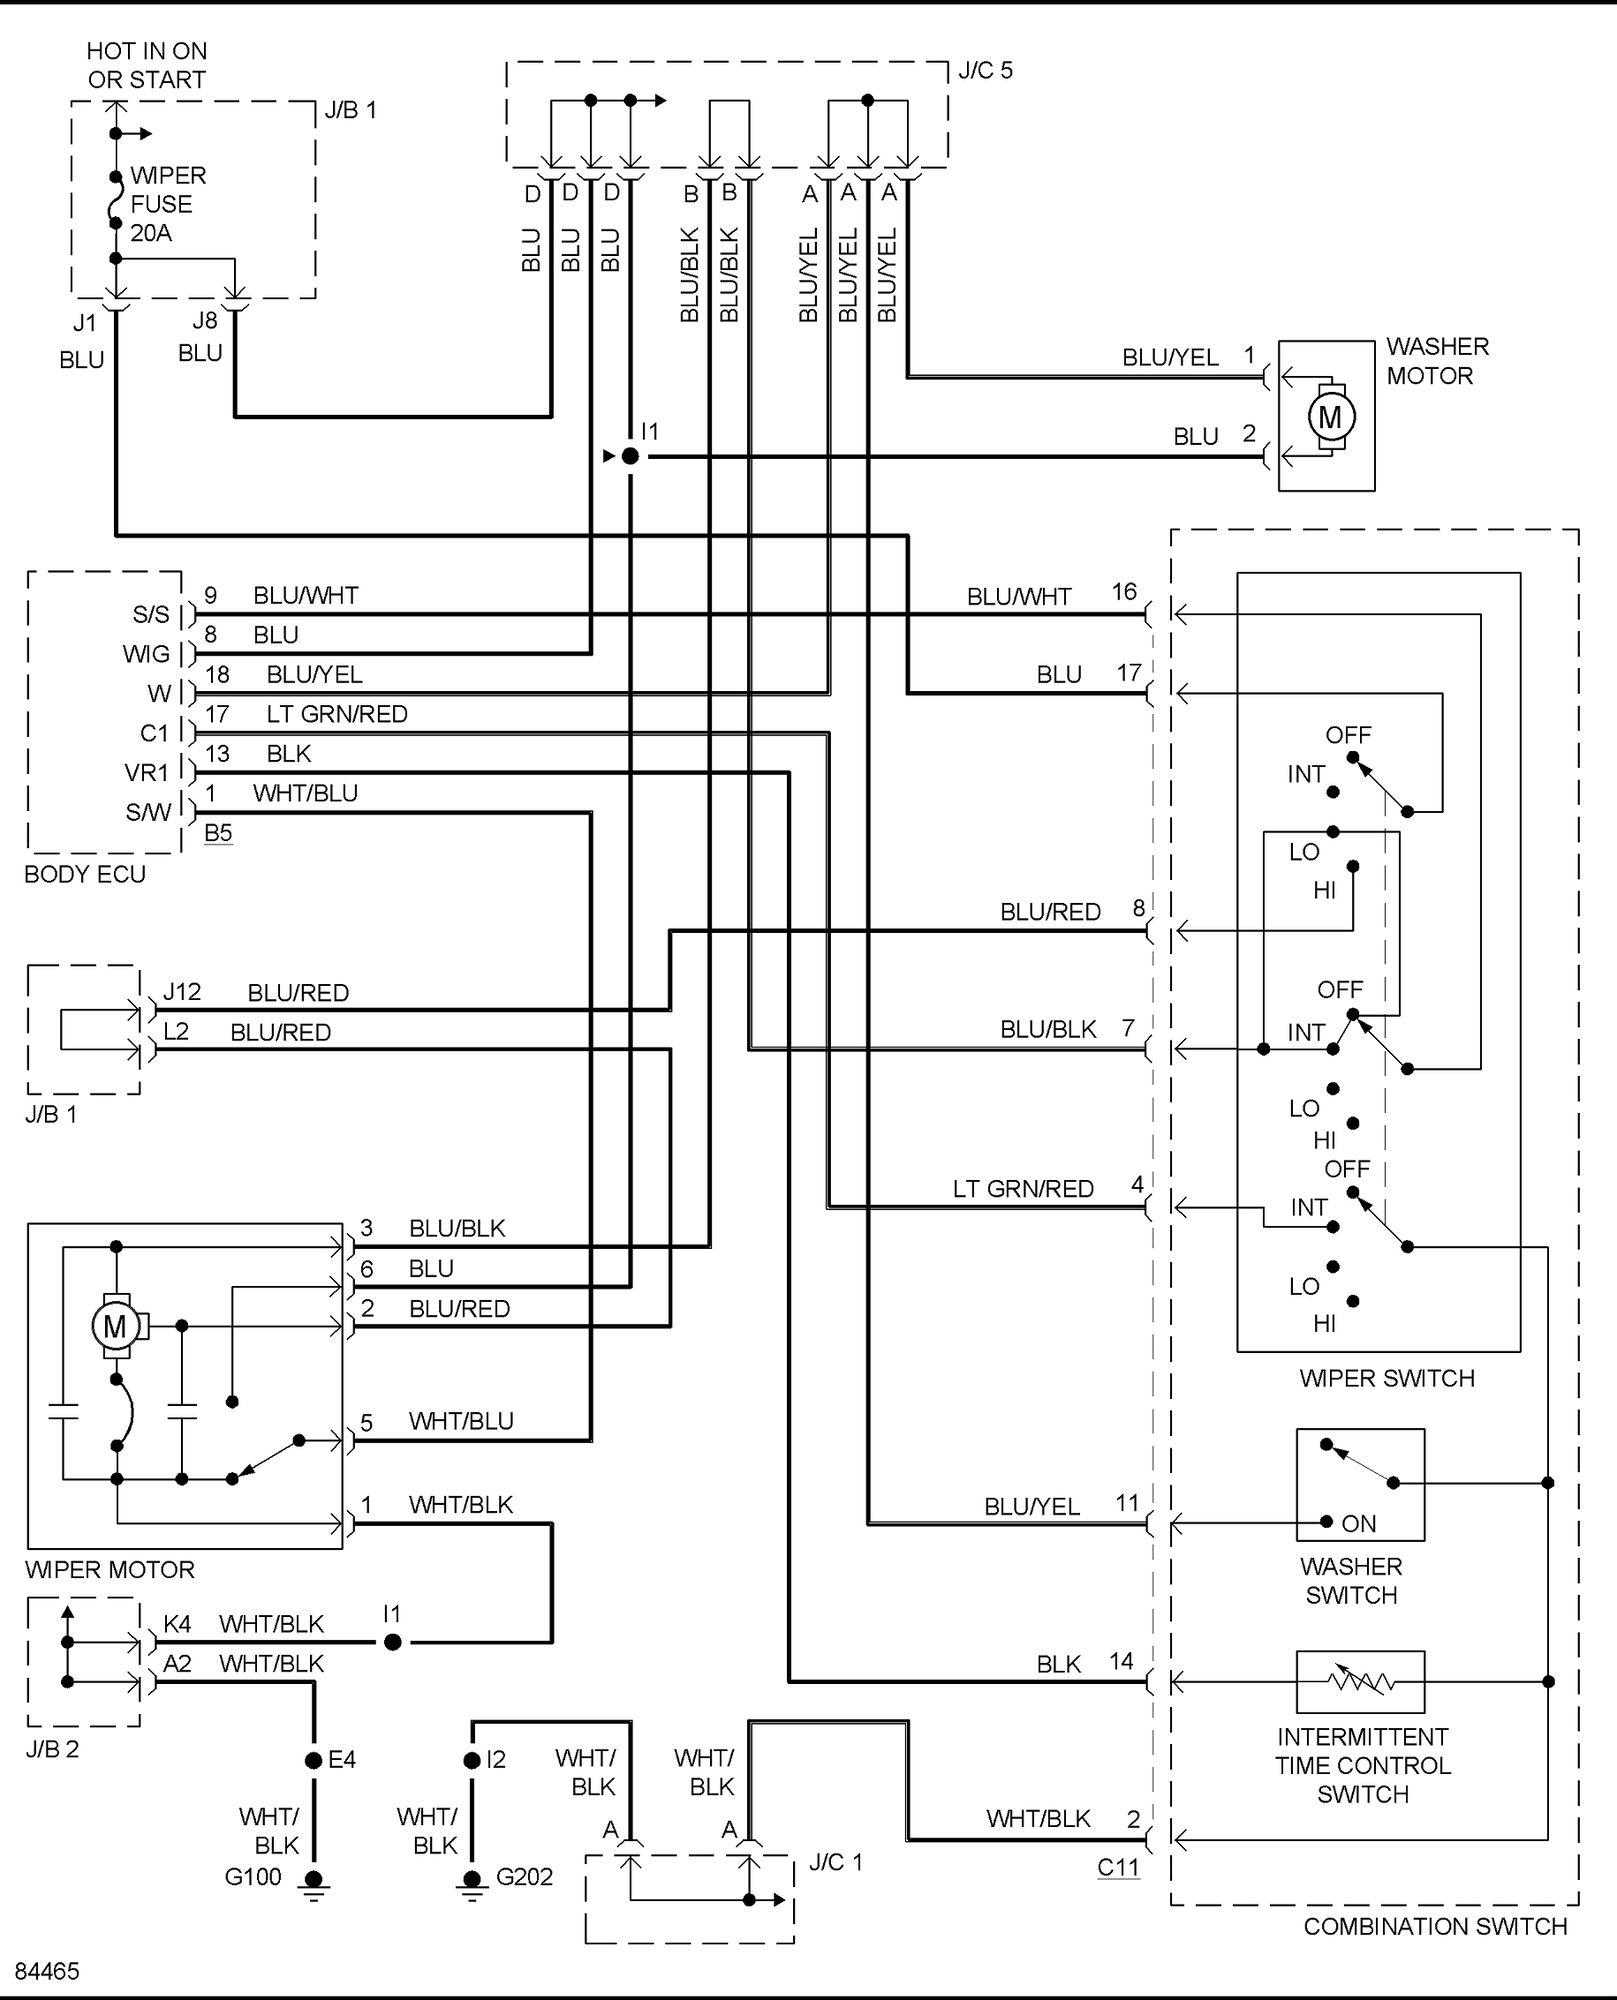 2001 R1 Tach Wiring Diagram. Diagram. Auto Wiring Diagram